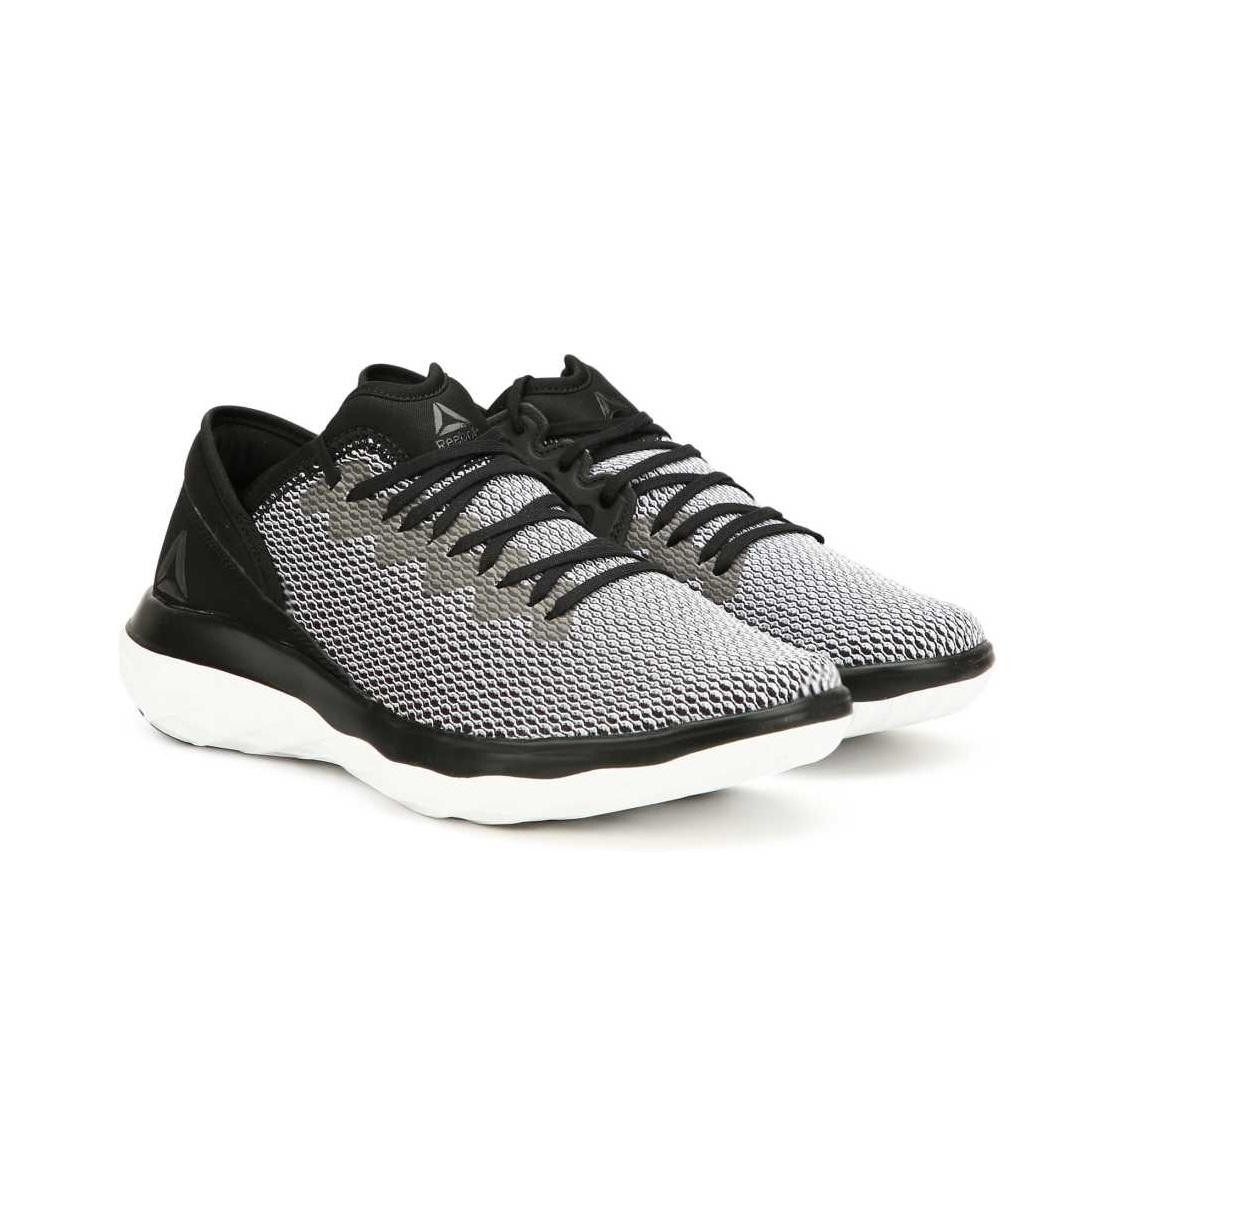 Reebok   REEBOK Unisex  ASTRORIDE FOREVER Running Shoes